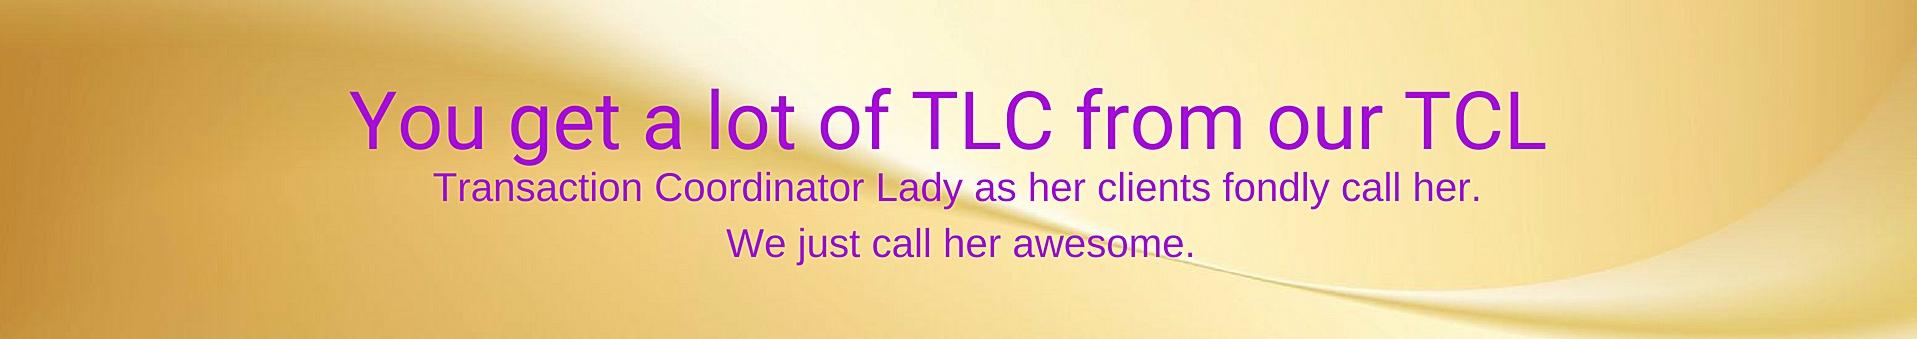 CeCe hampton Enterprises Transaction Coordinator, Jazalyn Mason, giving TLC to all her clients.